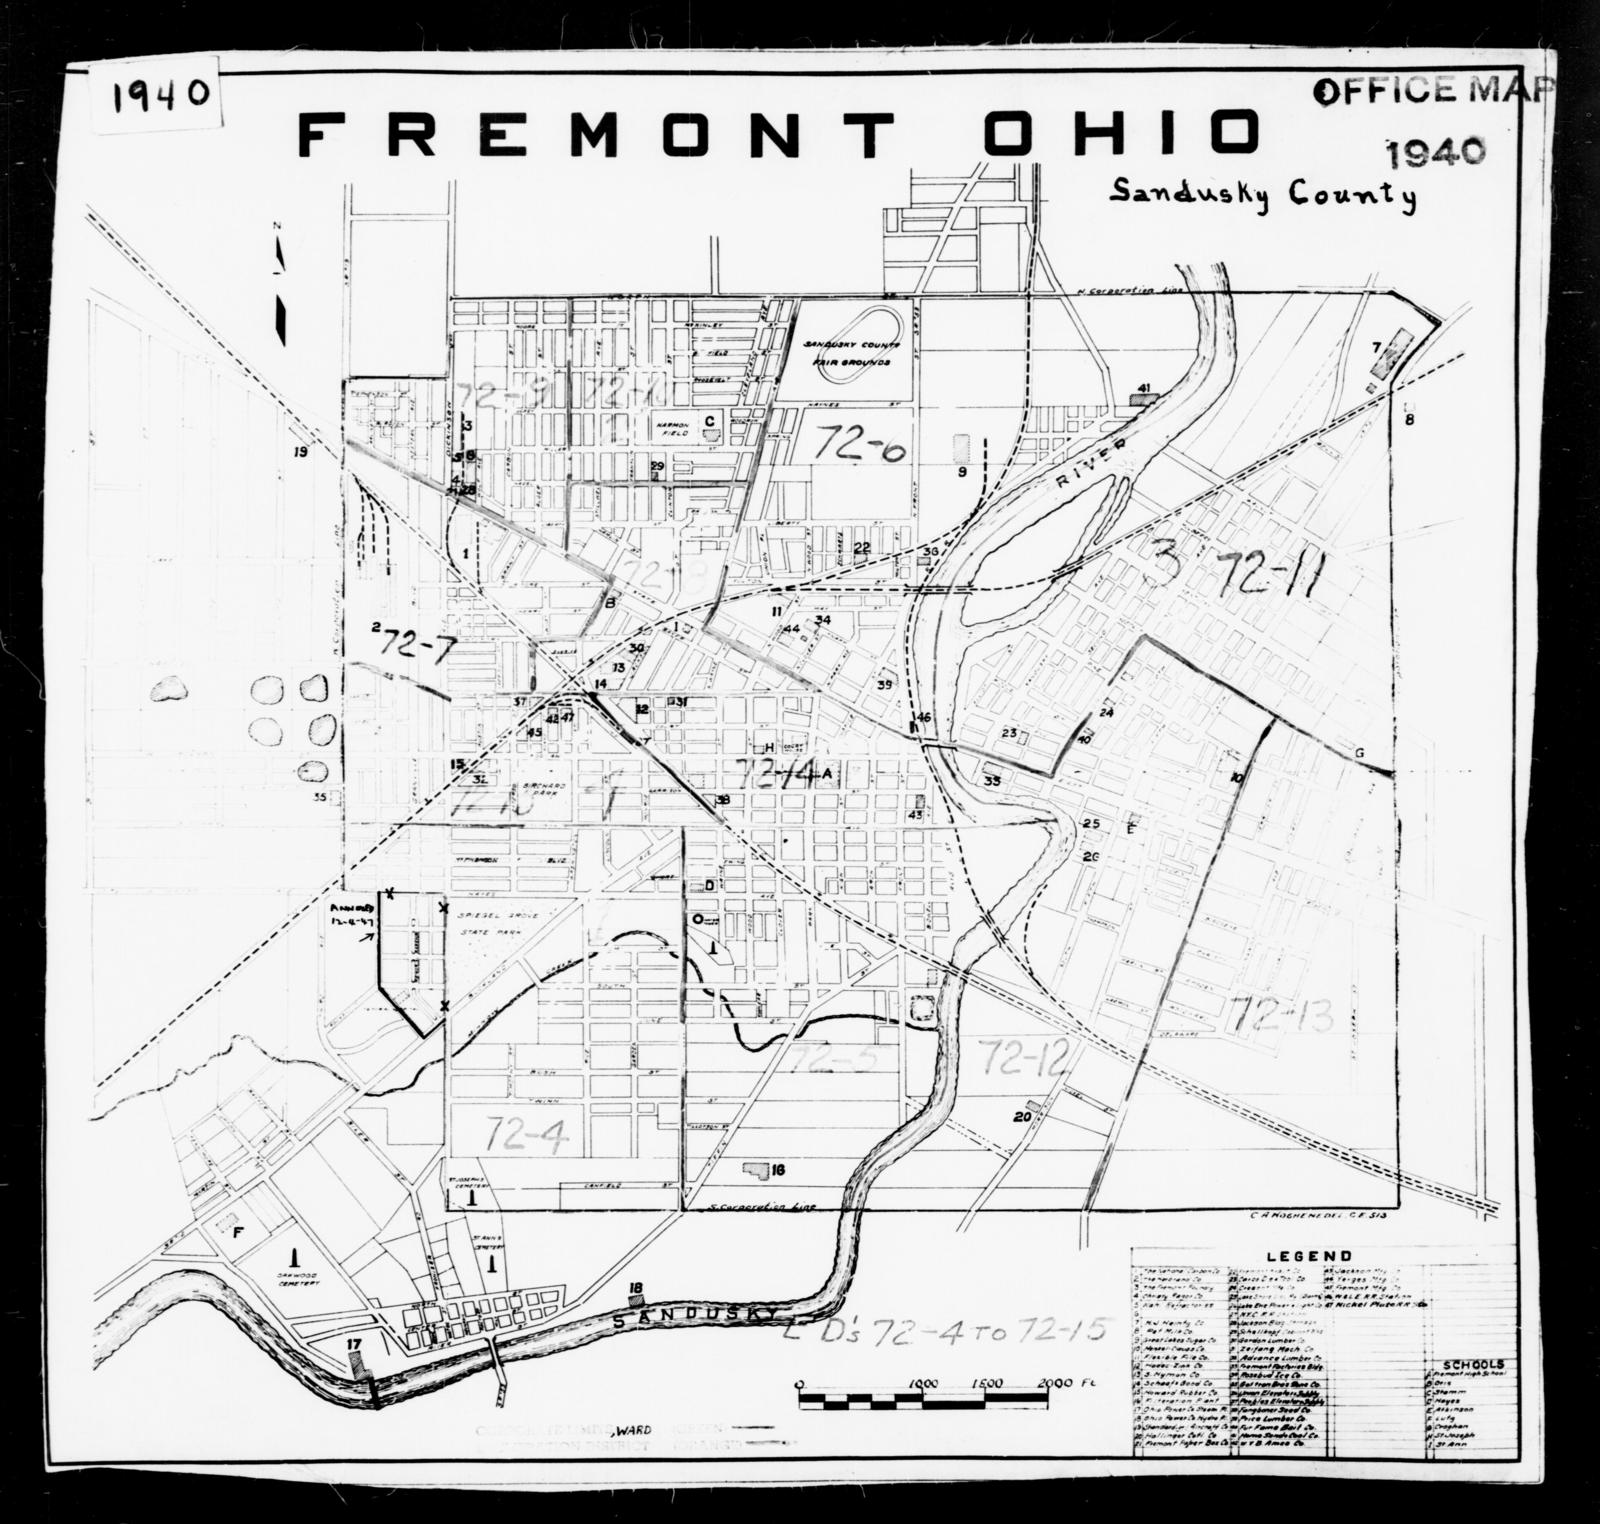 1940 Census Enumeration District Maps - Ohio - Sandusky County - Fremont - ED 72-4 - ED 72-15